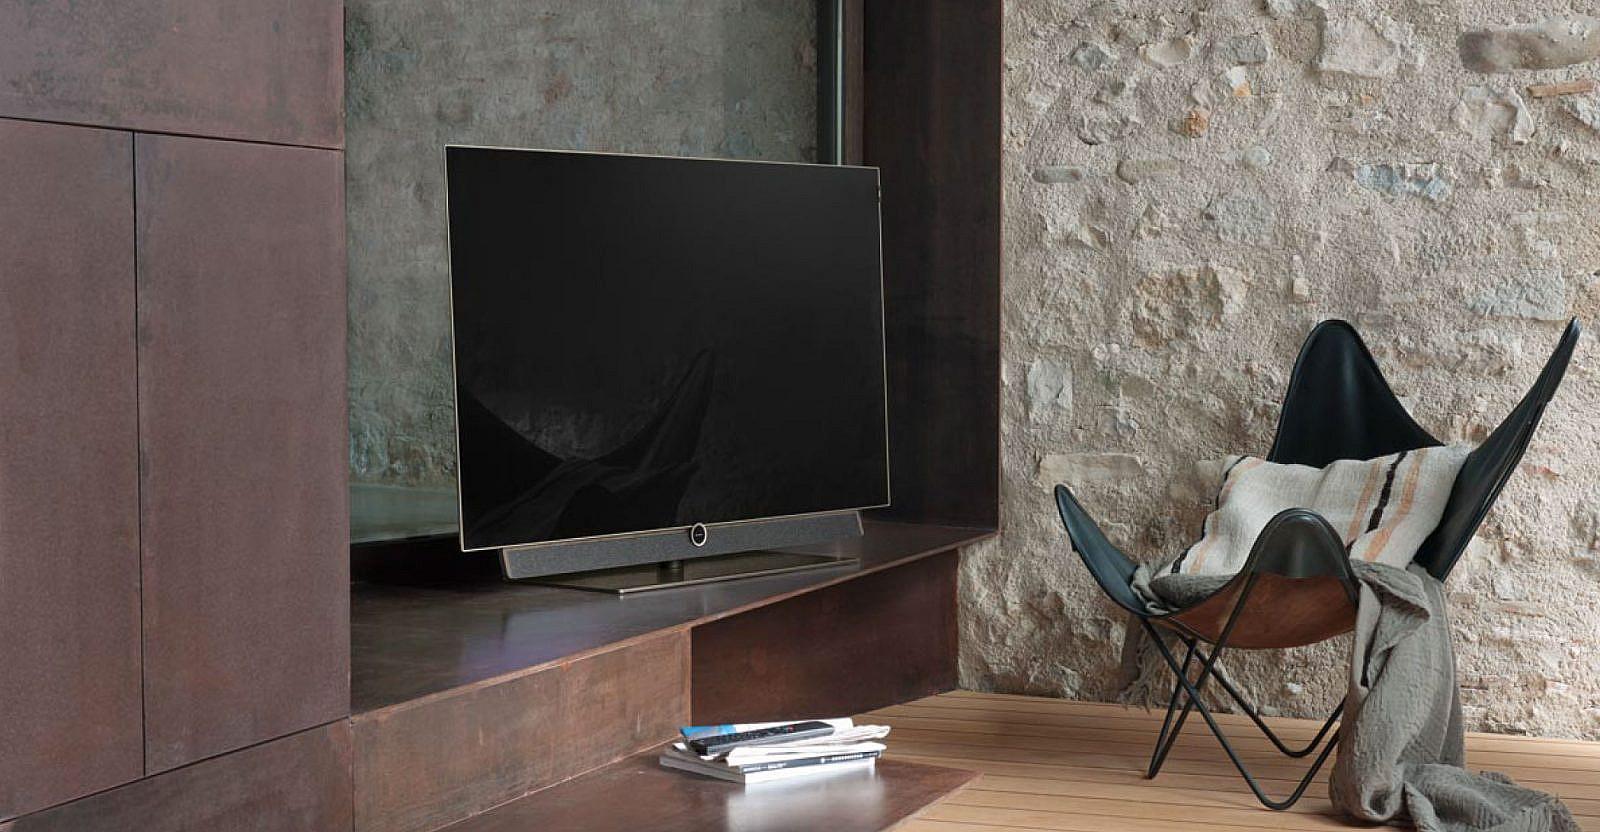 TV Loewe: senza interessi, senza spese